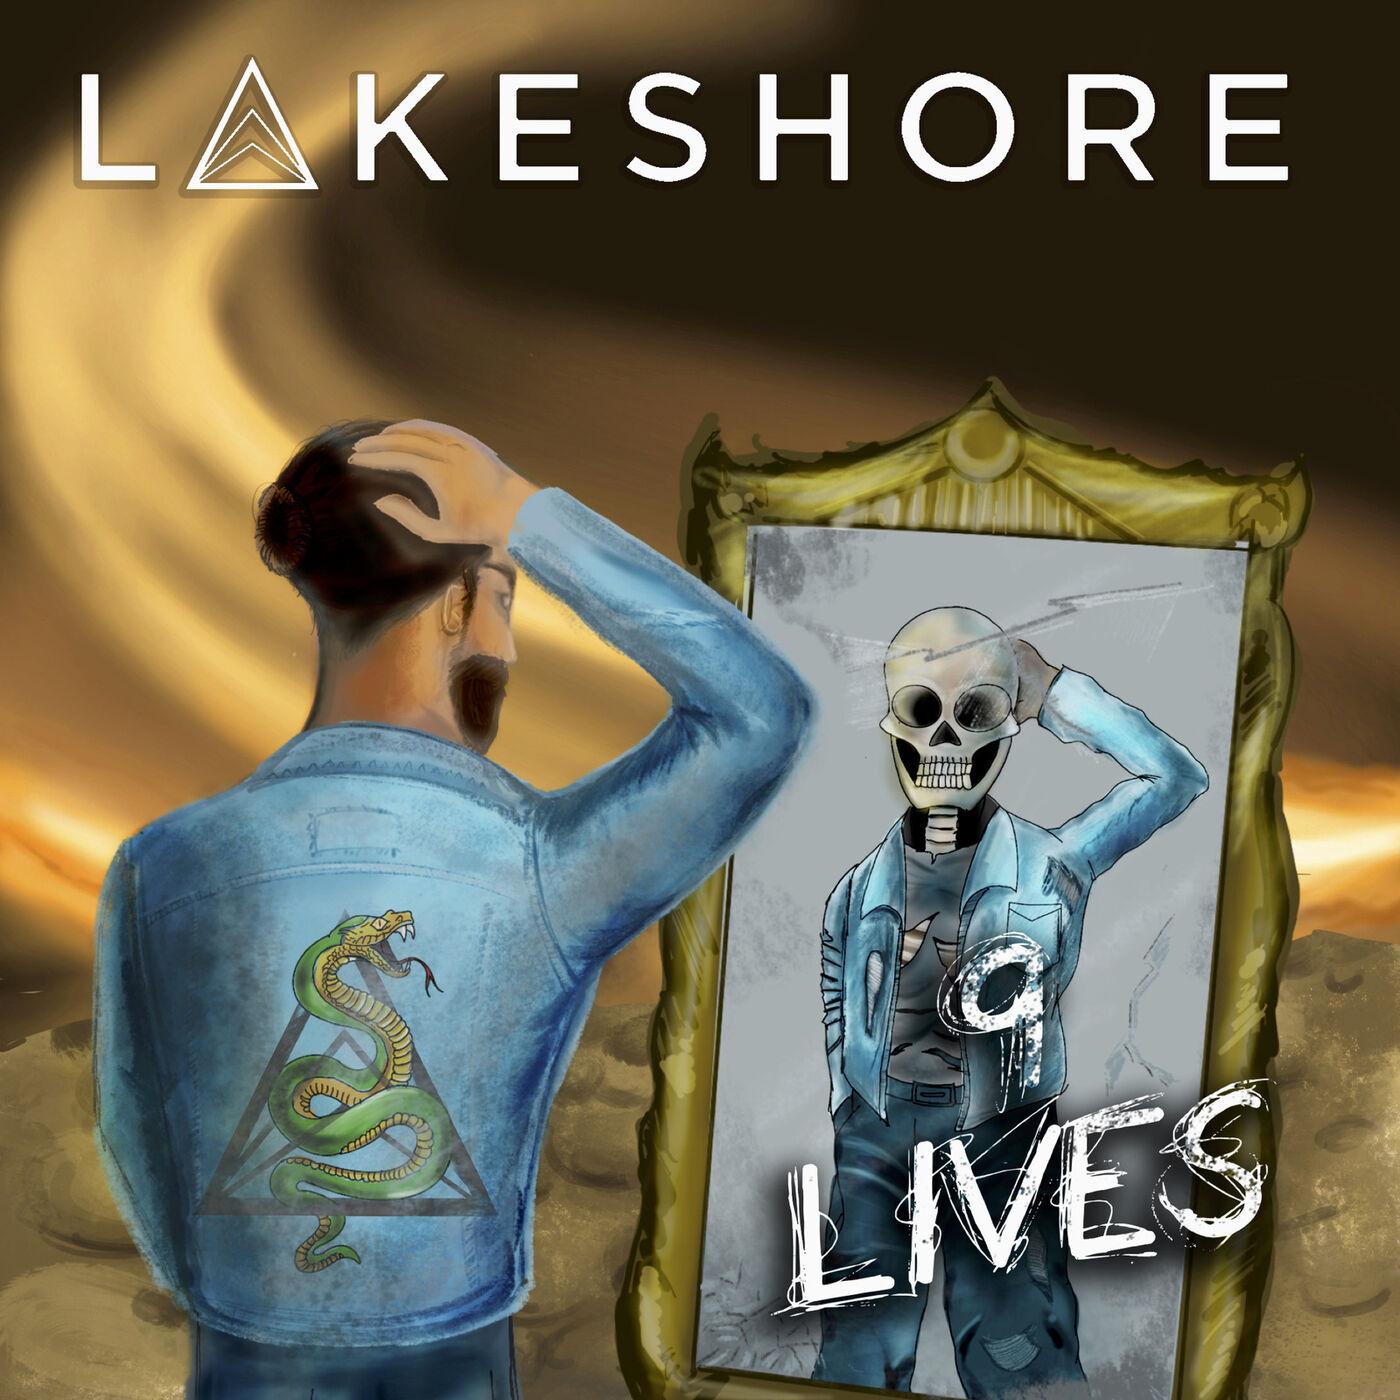 Lakeshore - 9 Lives [single] (2020)